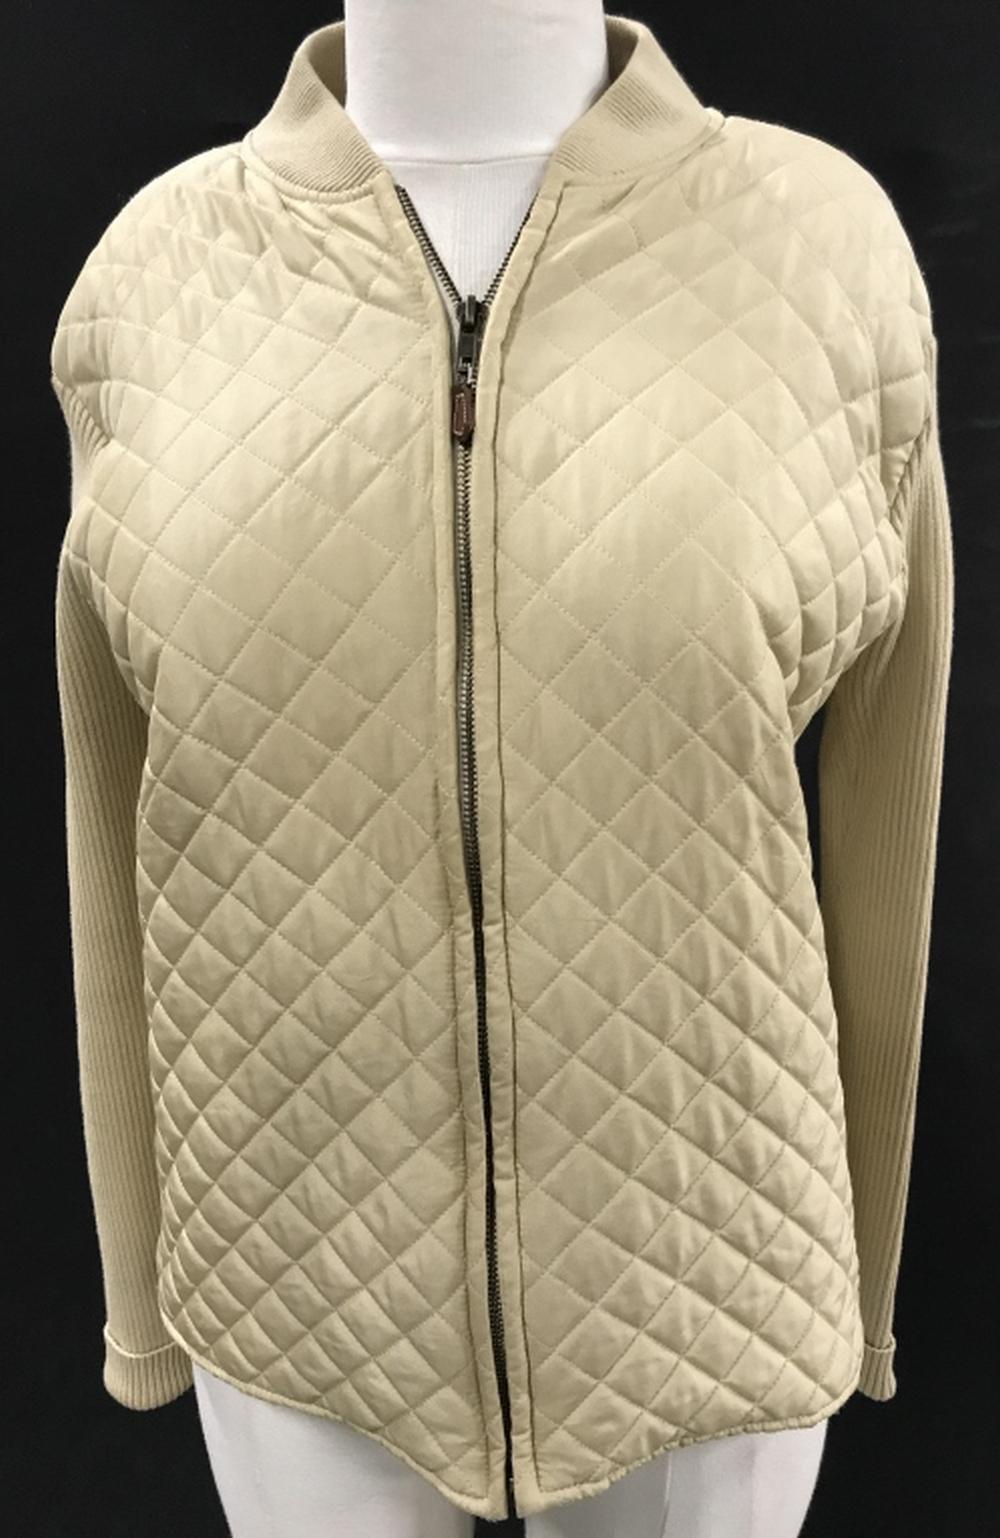 Designer J. McLaughlin Quilted Silk Zip Jacket